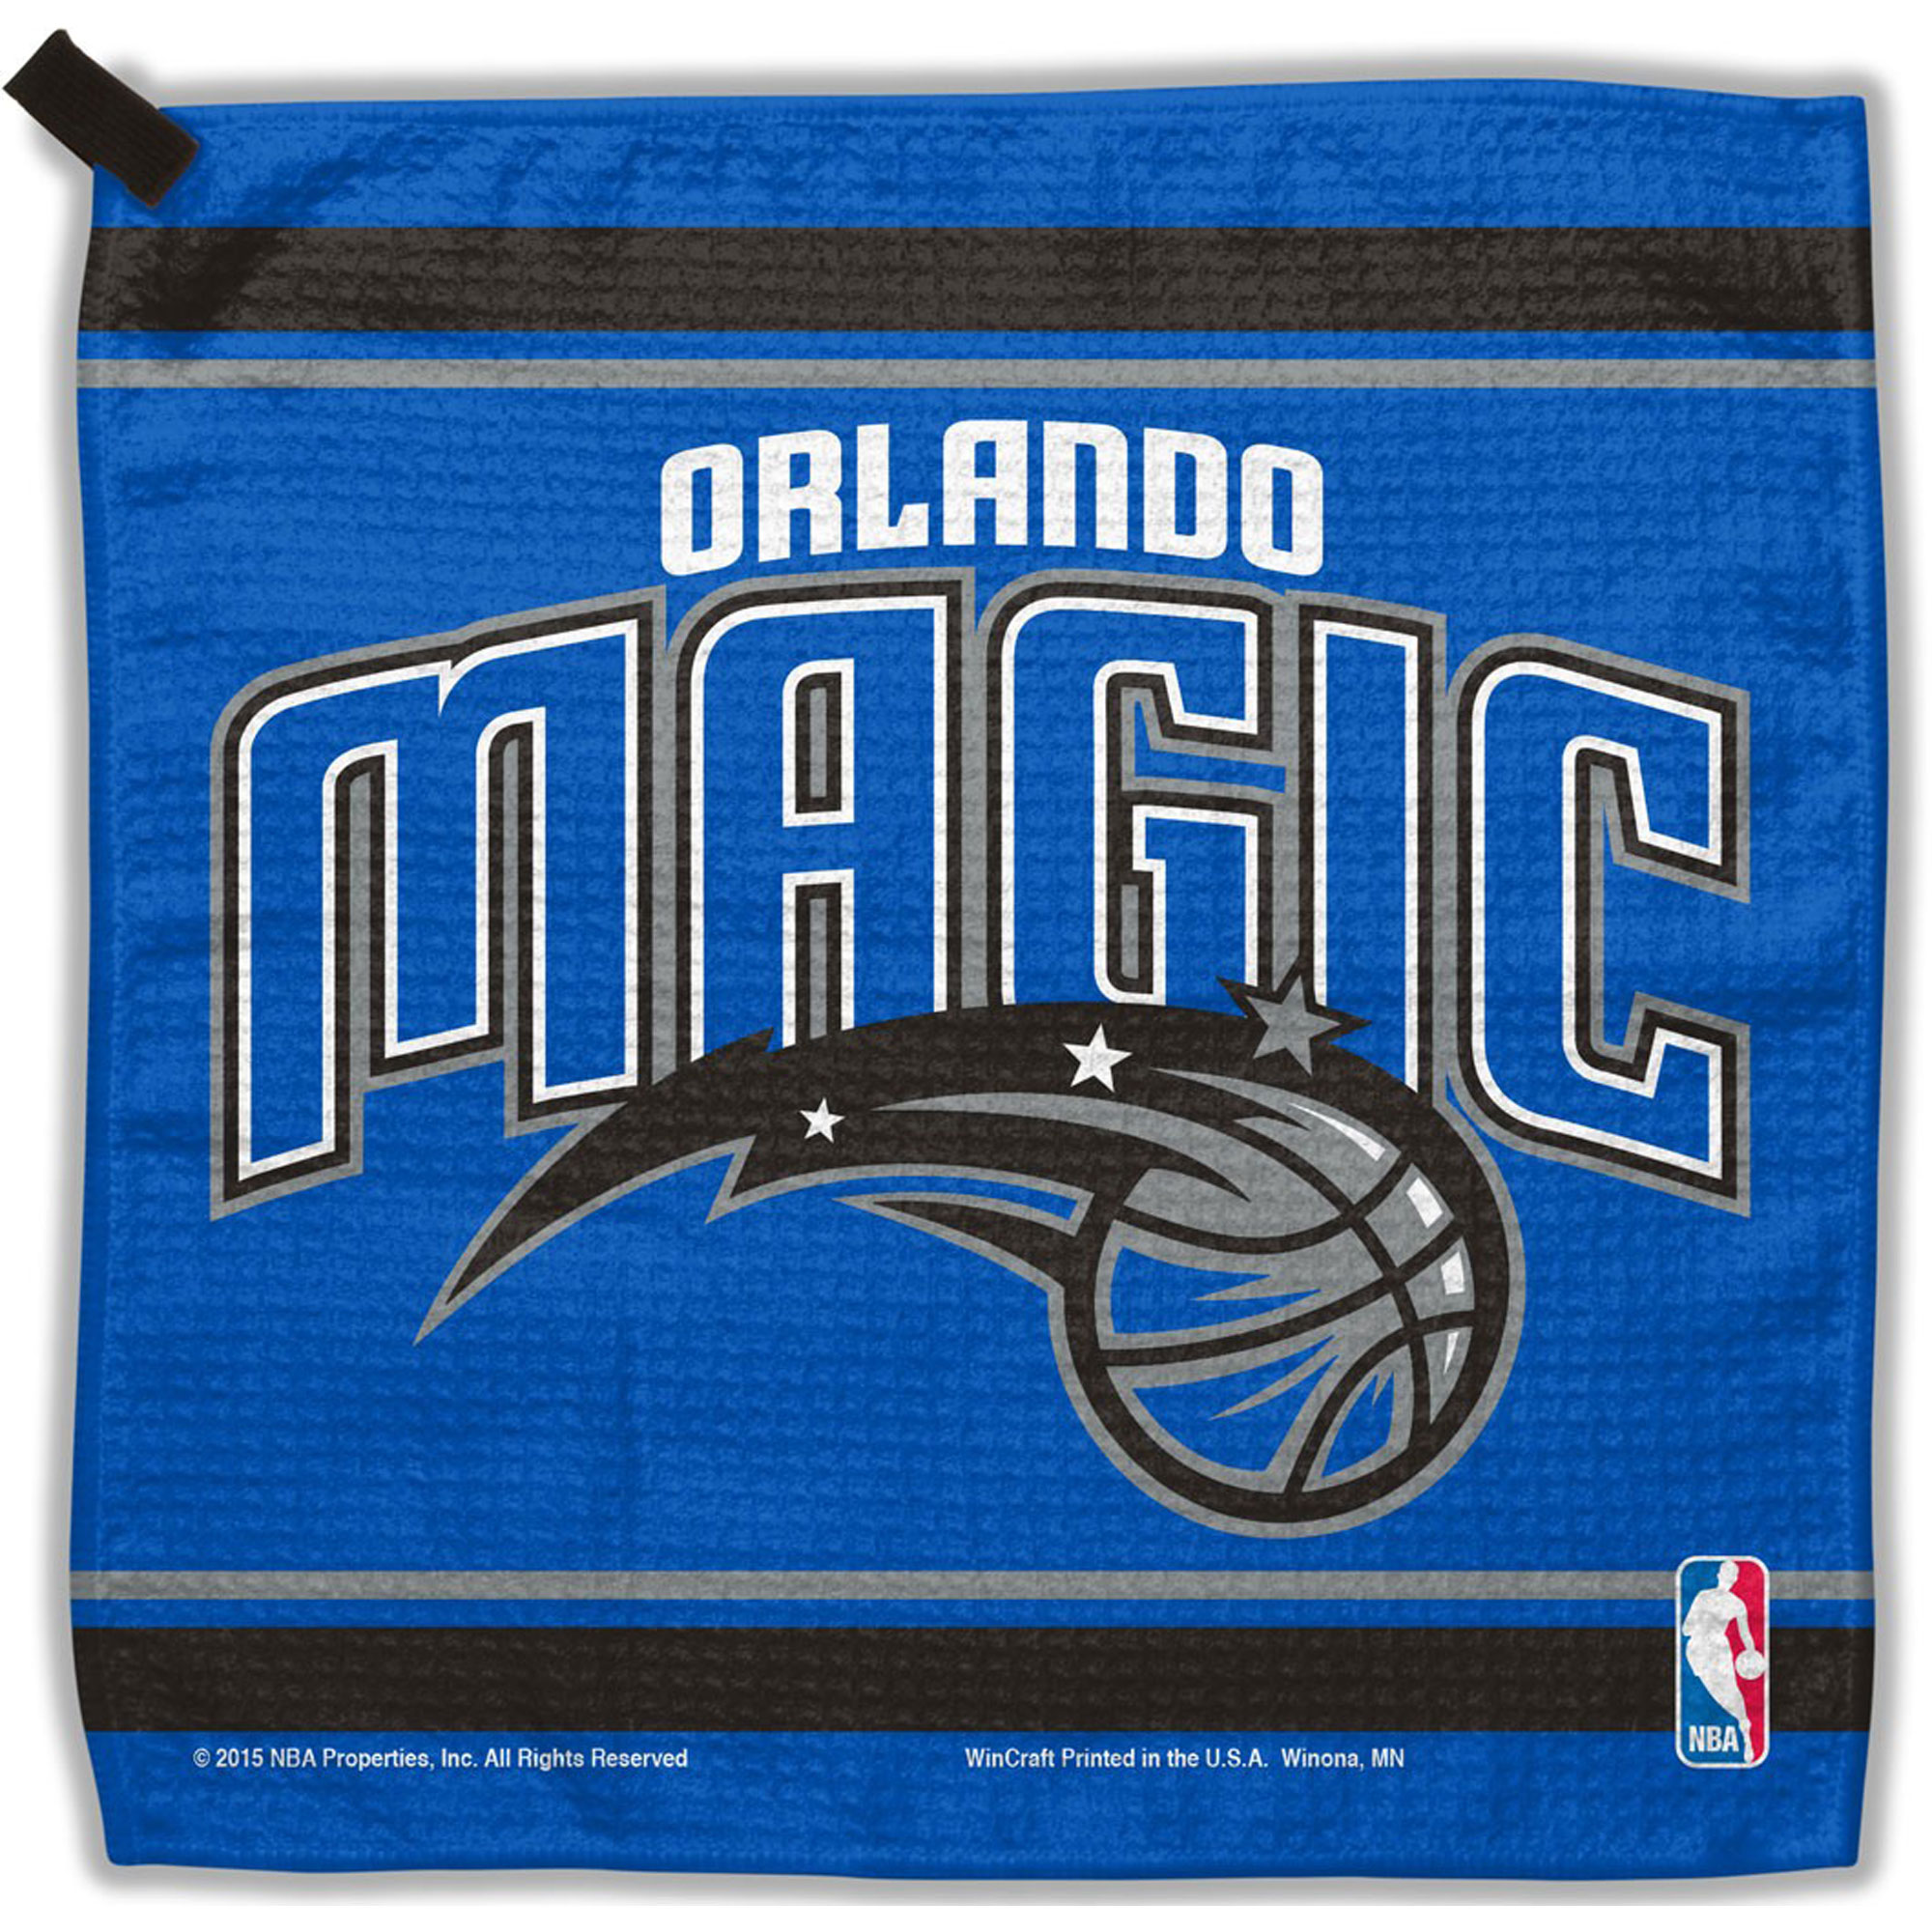 "Orlando Magic WinCraft 13"" x 13"" Waffle Towel - No Size"